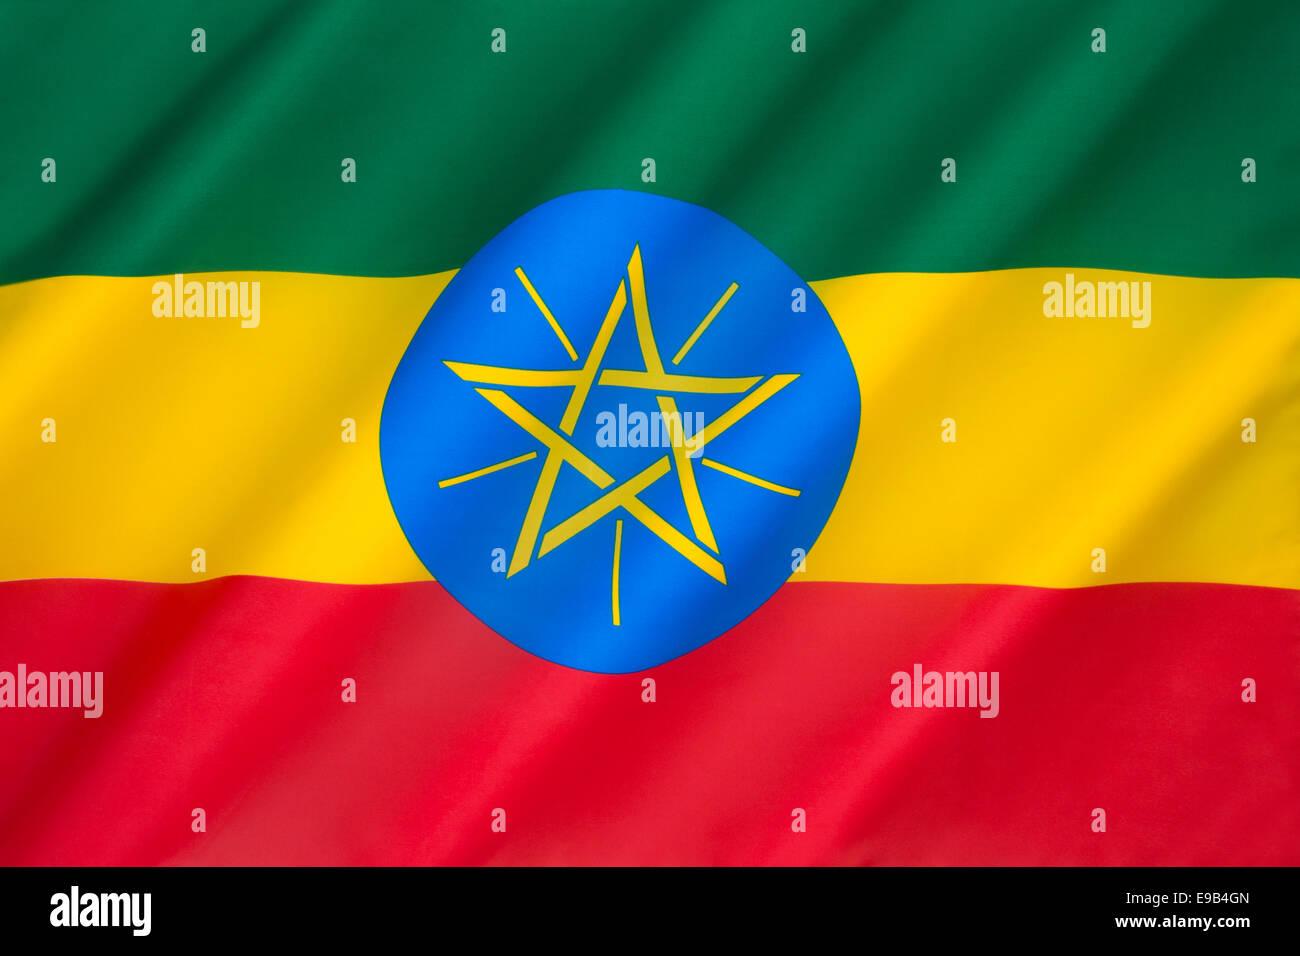 Flag of the Federal Democratic Republic of Ethiopia - Stock Image